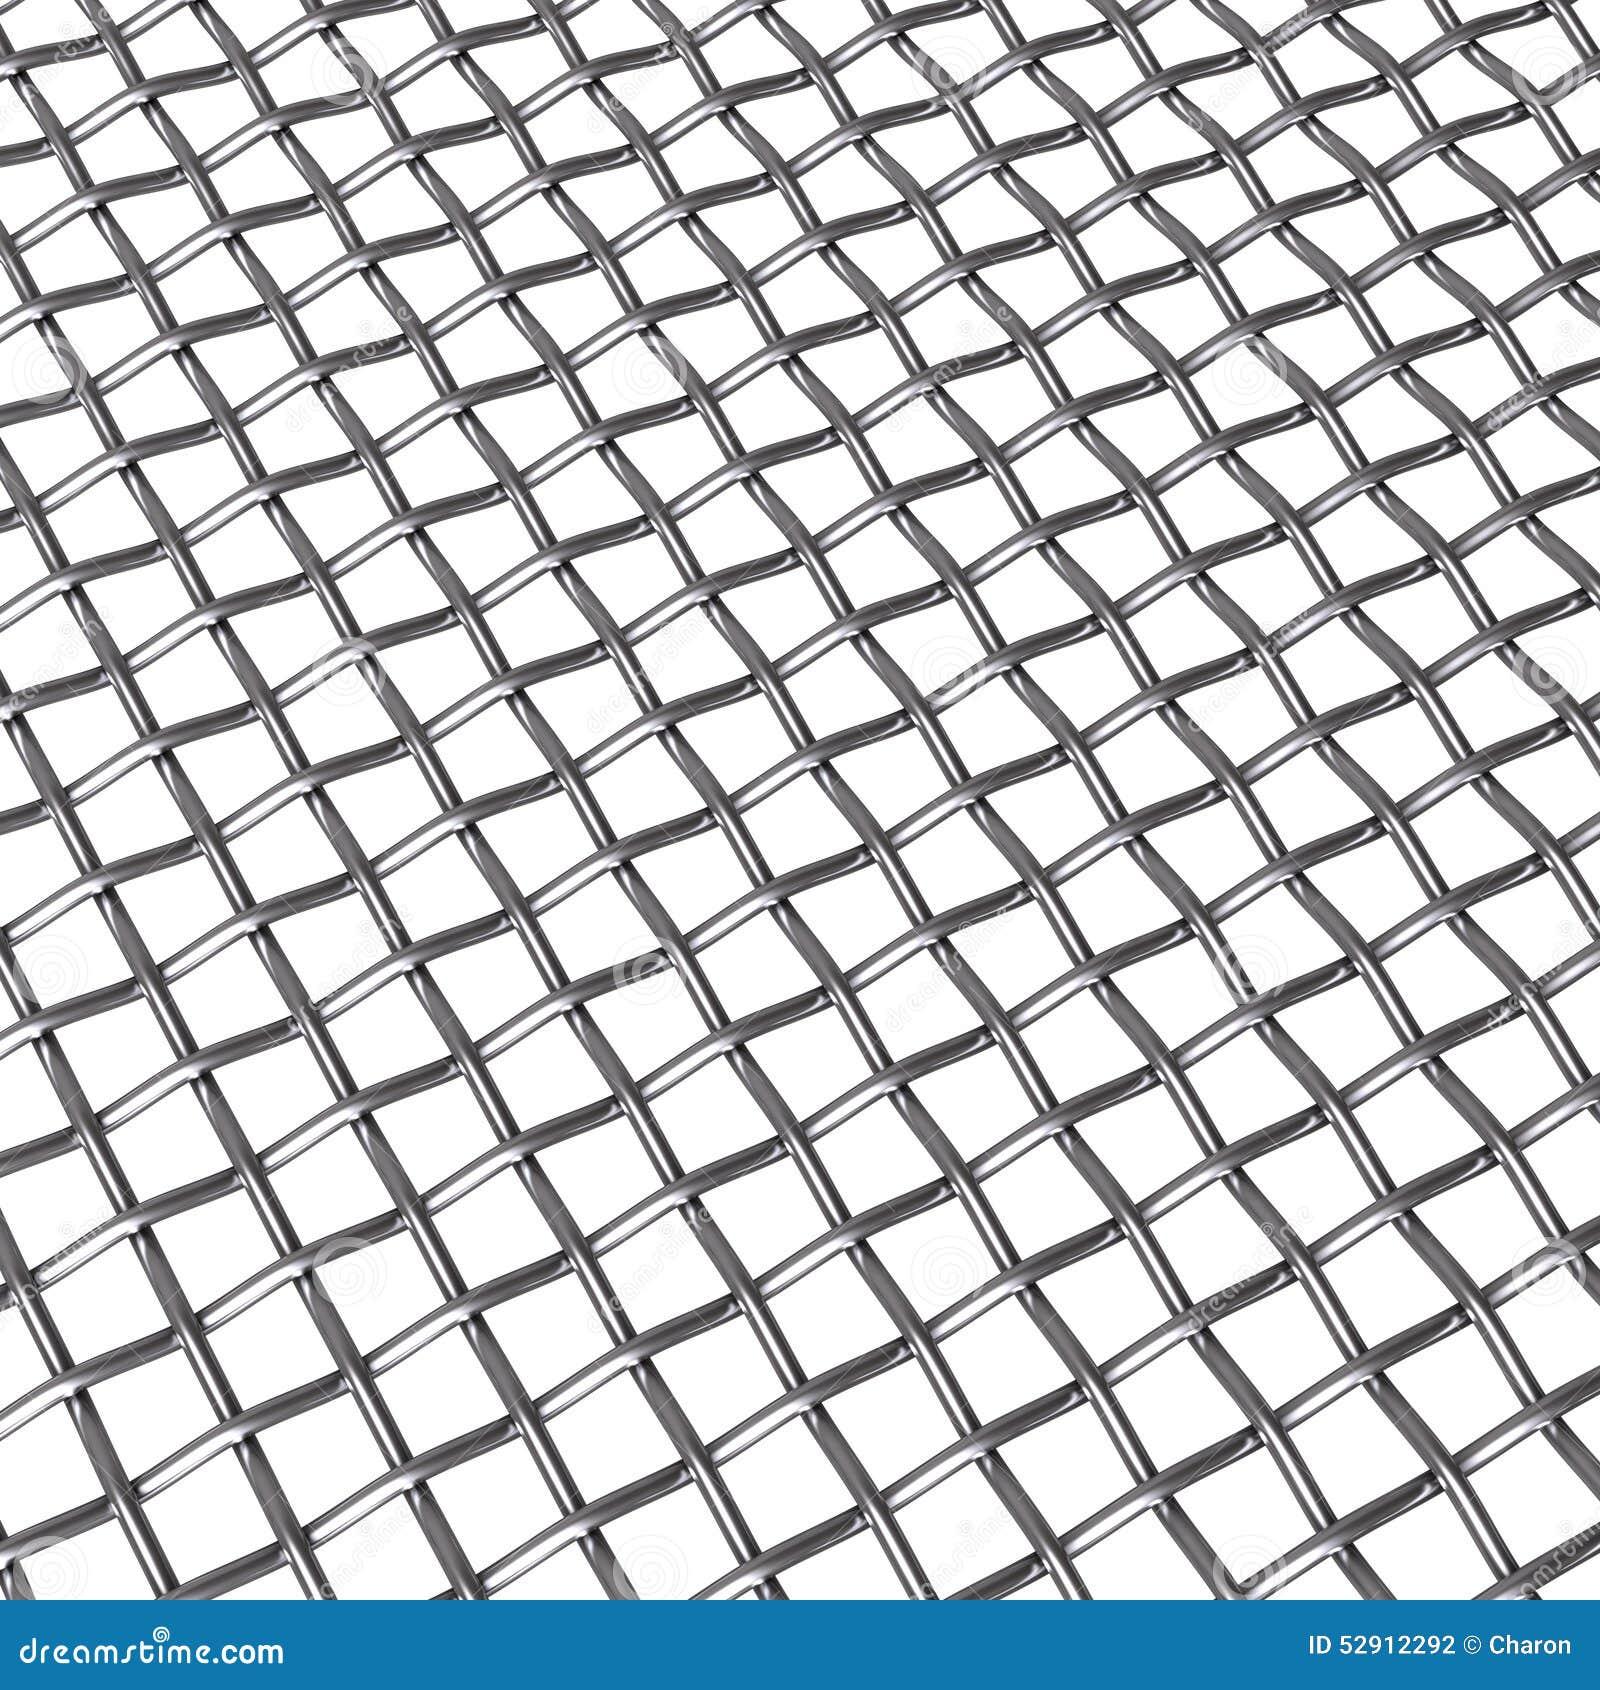 Wire Mesh Texture Stock Photo Image 52912292